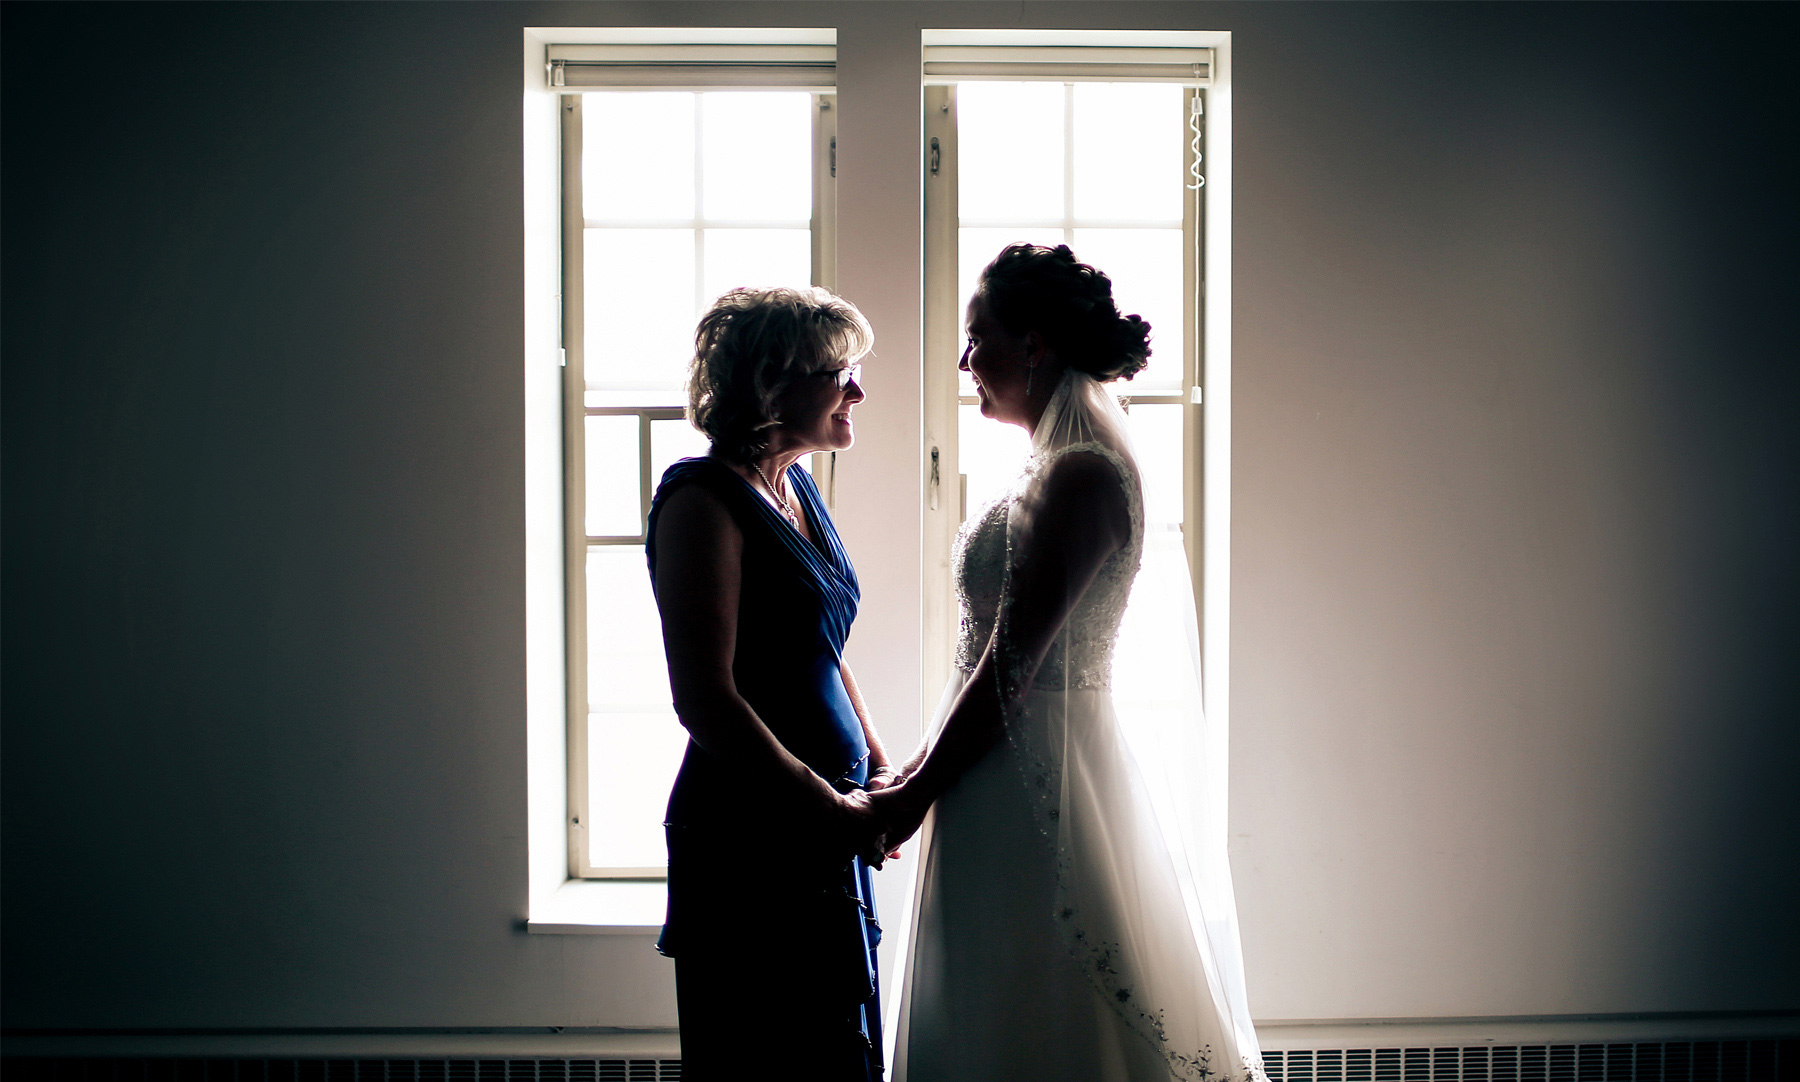 01-Minneapolis-Minnesota-Wedding-Photography-by-Vick-Photography-Edina-Wedding-Morning-Grace-&-Nick.jpg